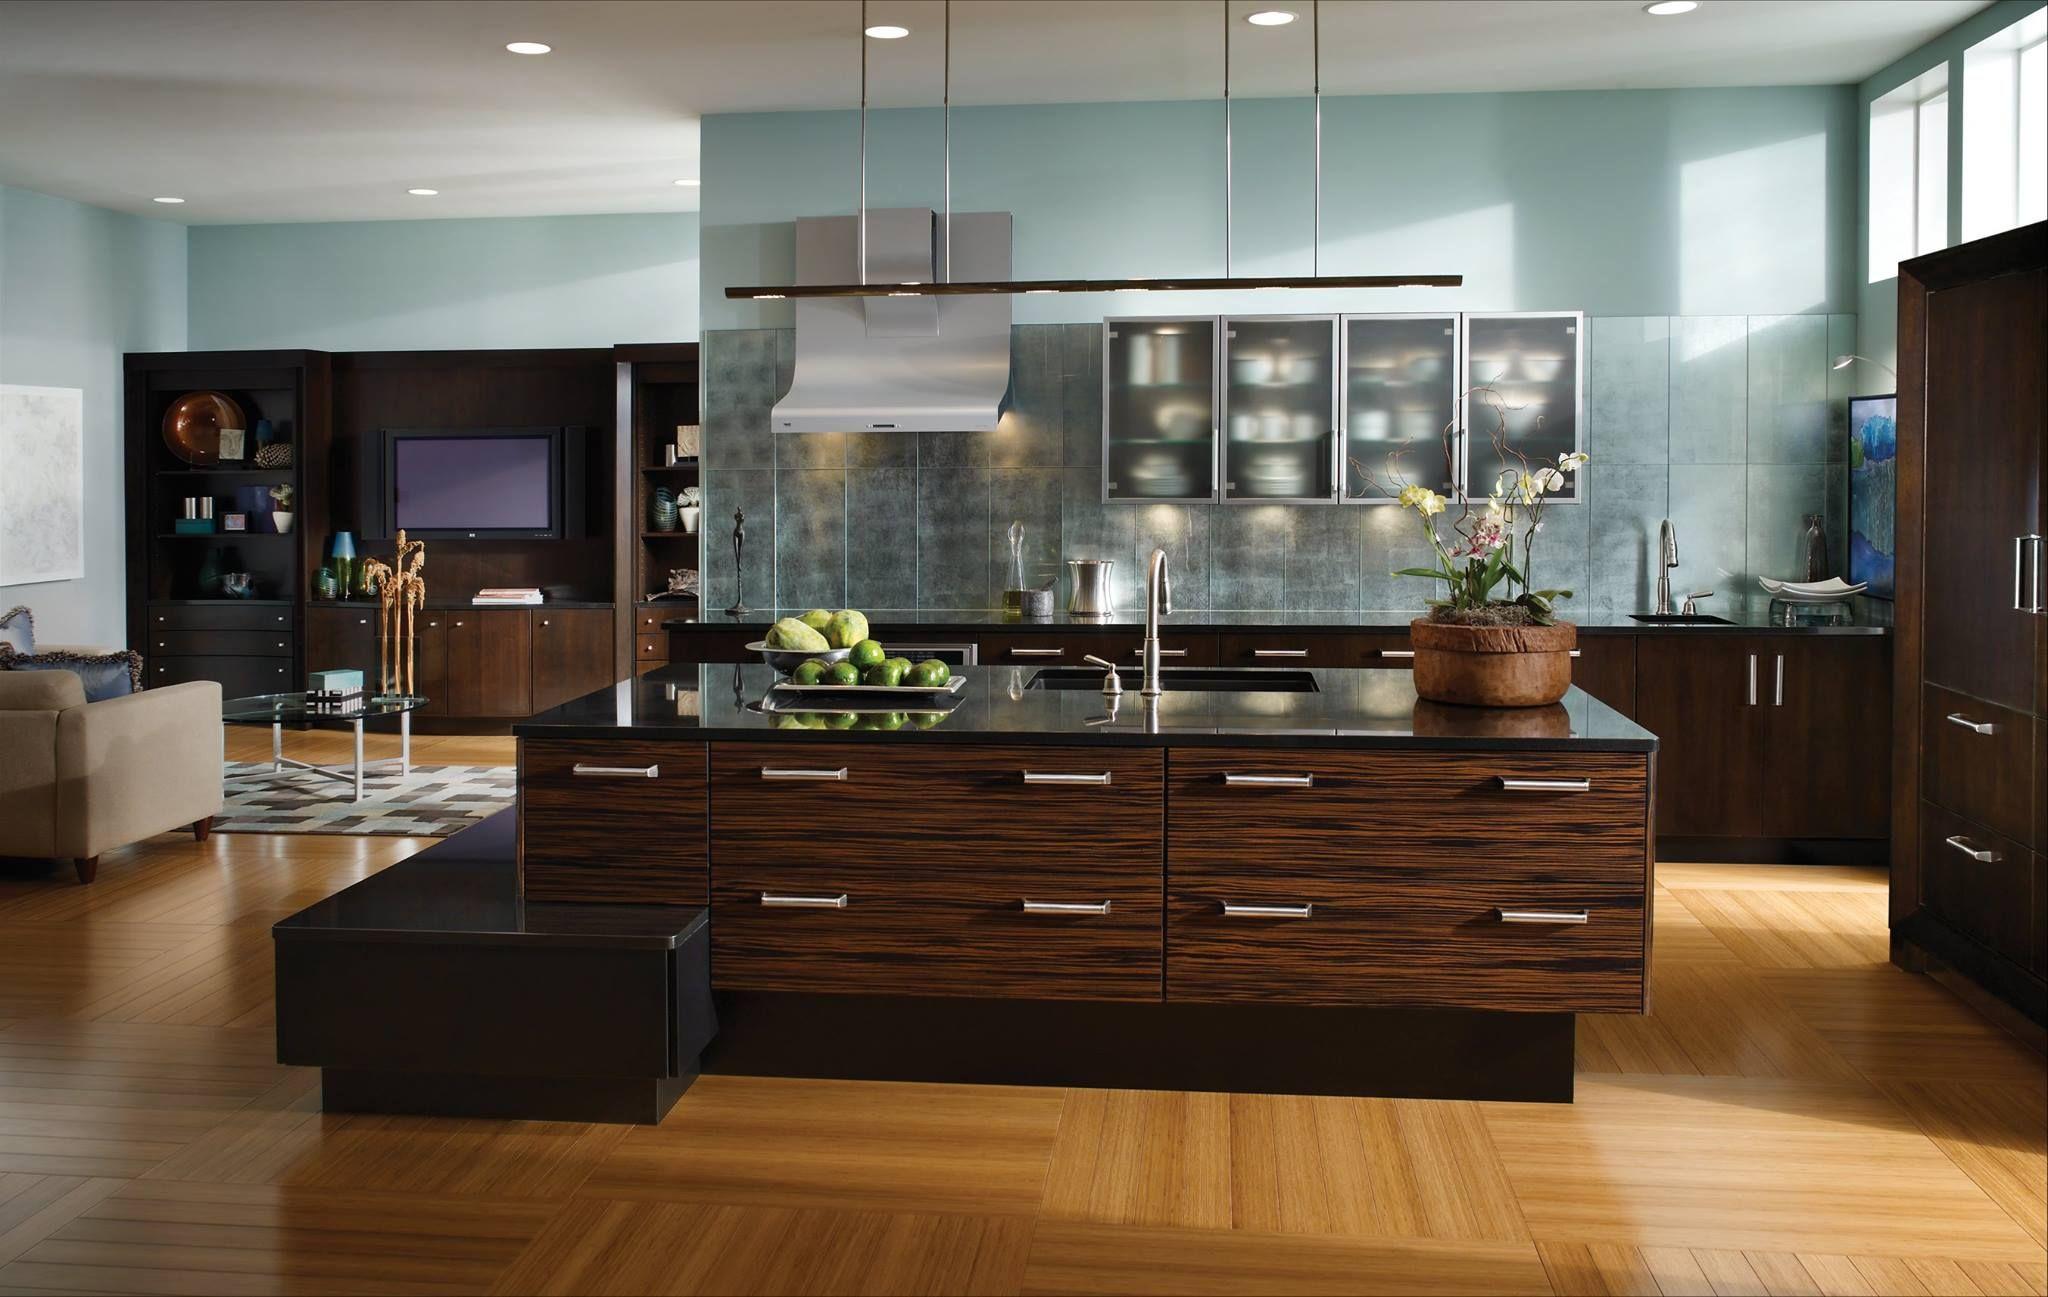 WoodMode Houston, Texas Kitchen and bath